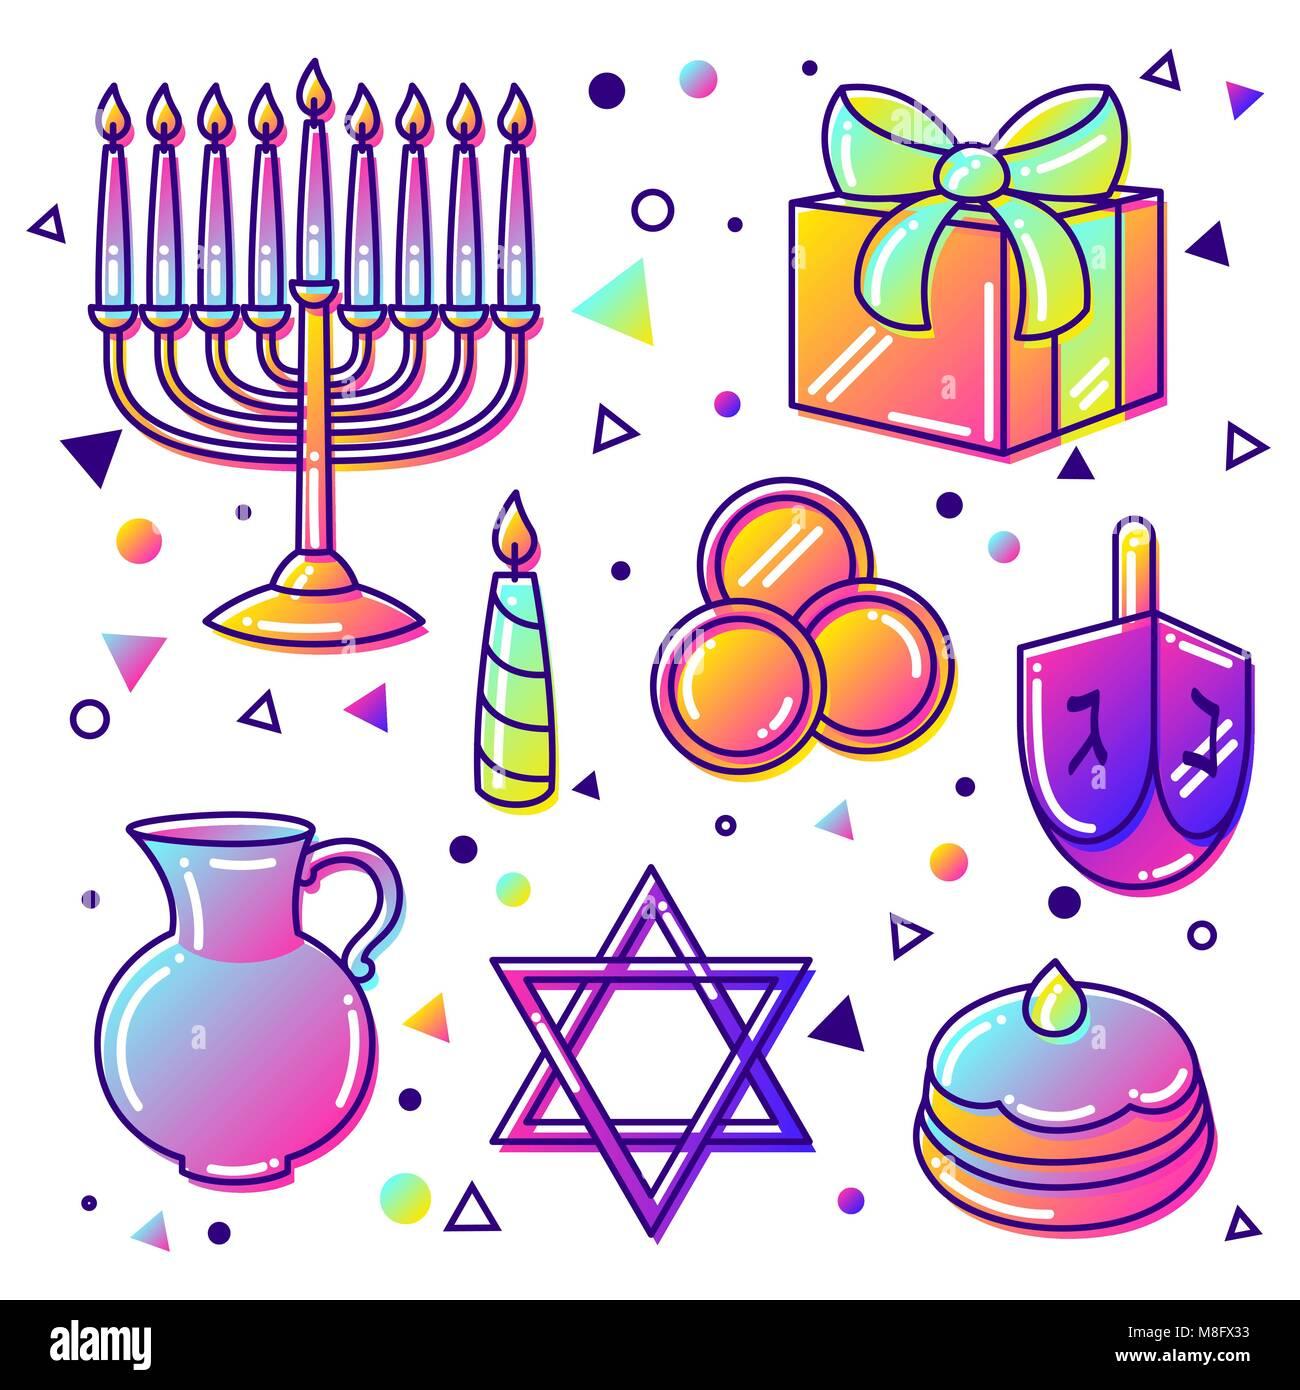 Set of Happy Hanukkah celebration objects and icons - Stock Image